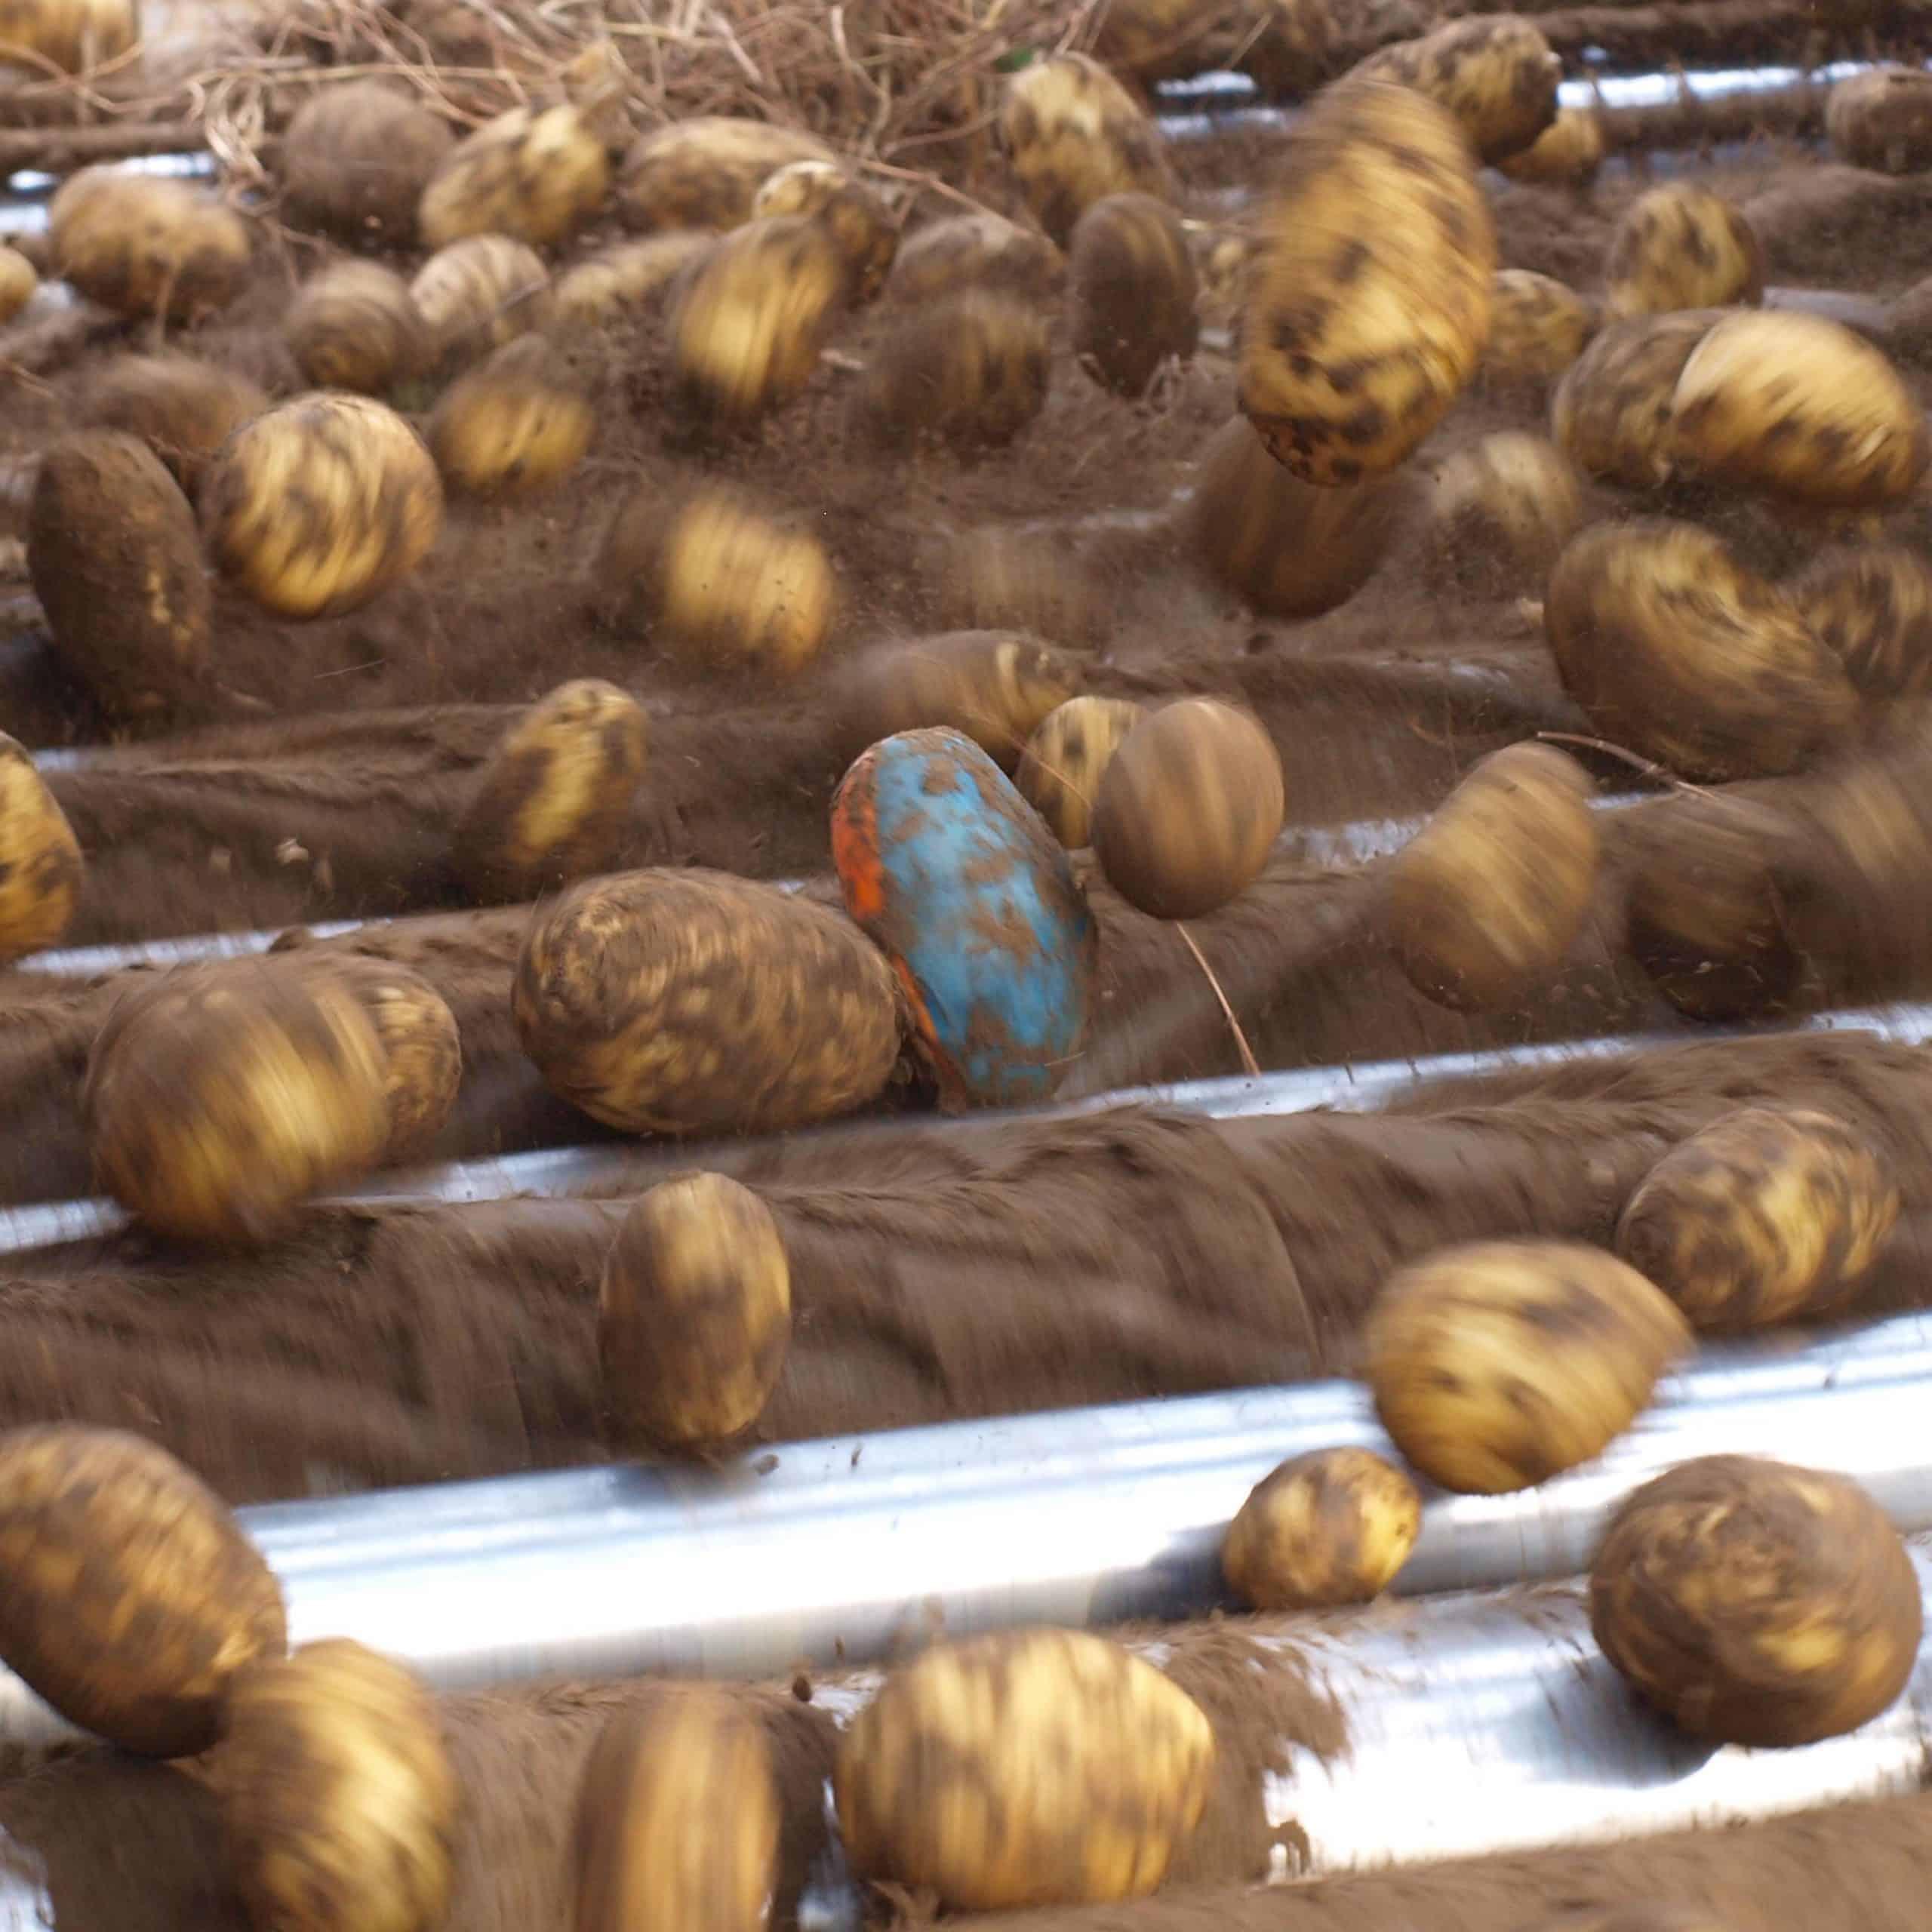 tuberlog electronic potato used by potato growers to help fine tune harvesting equipment